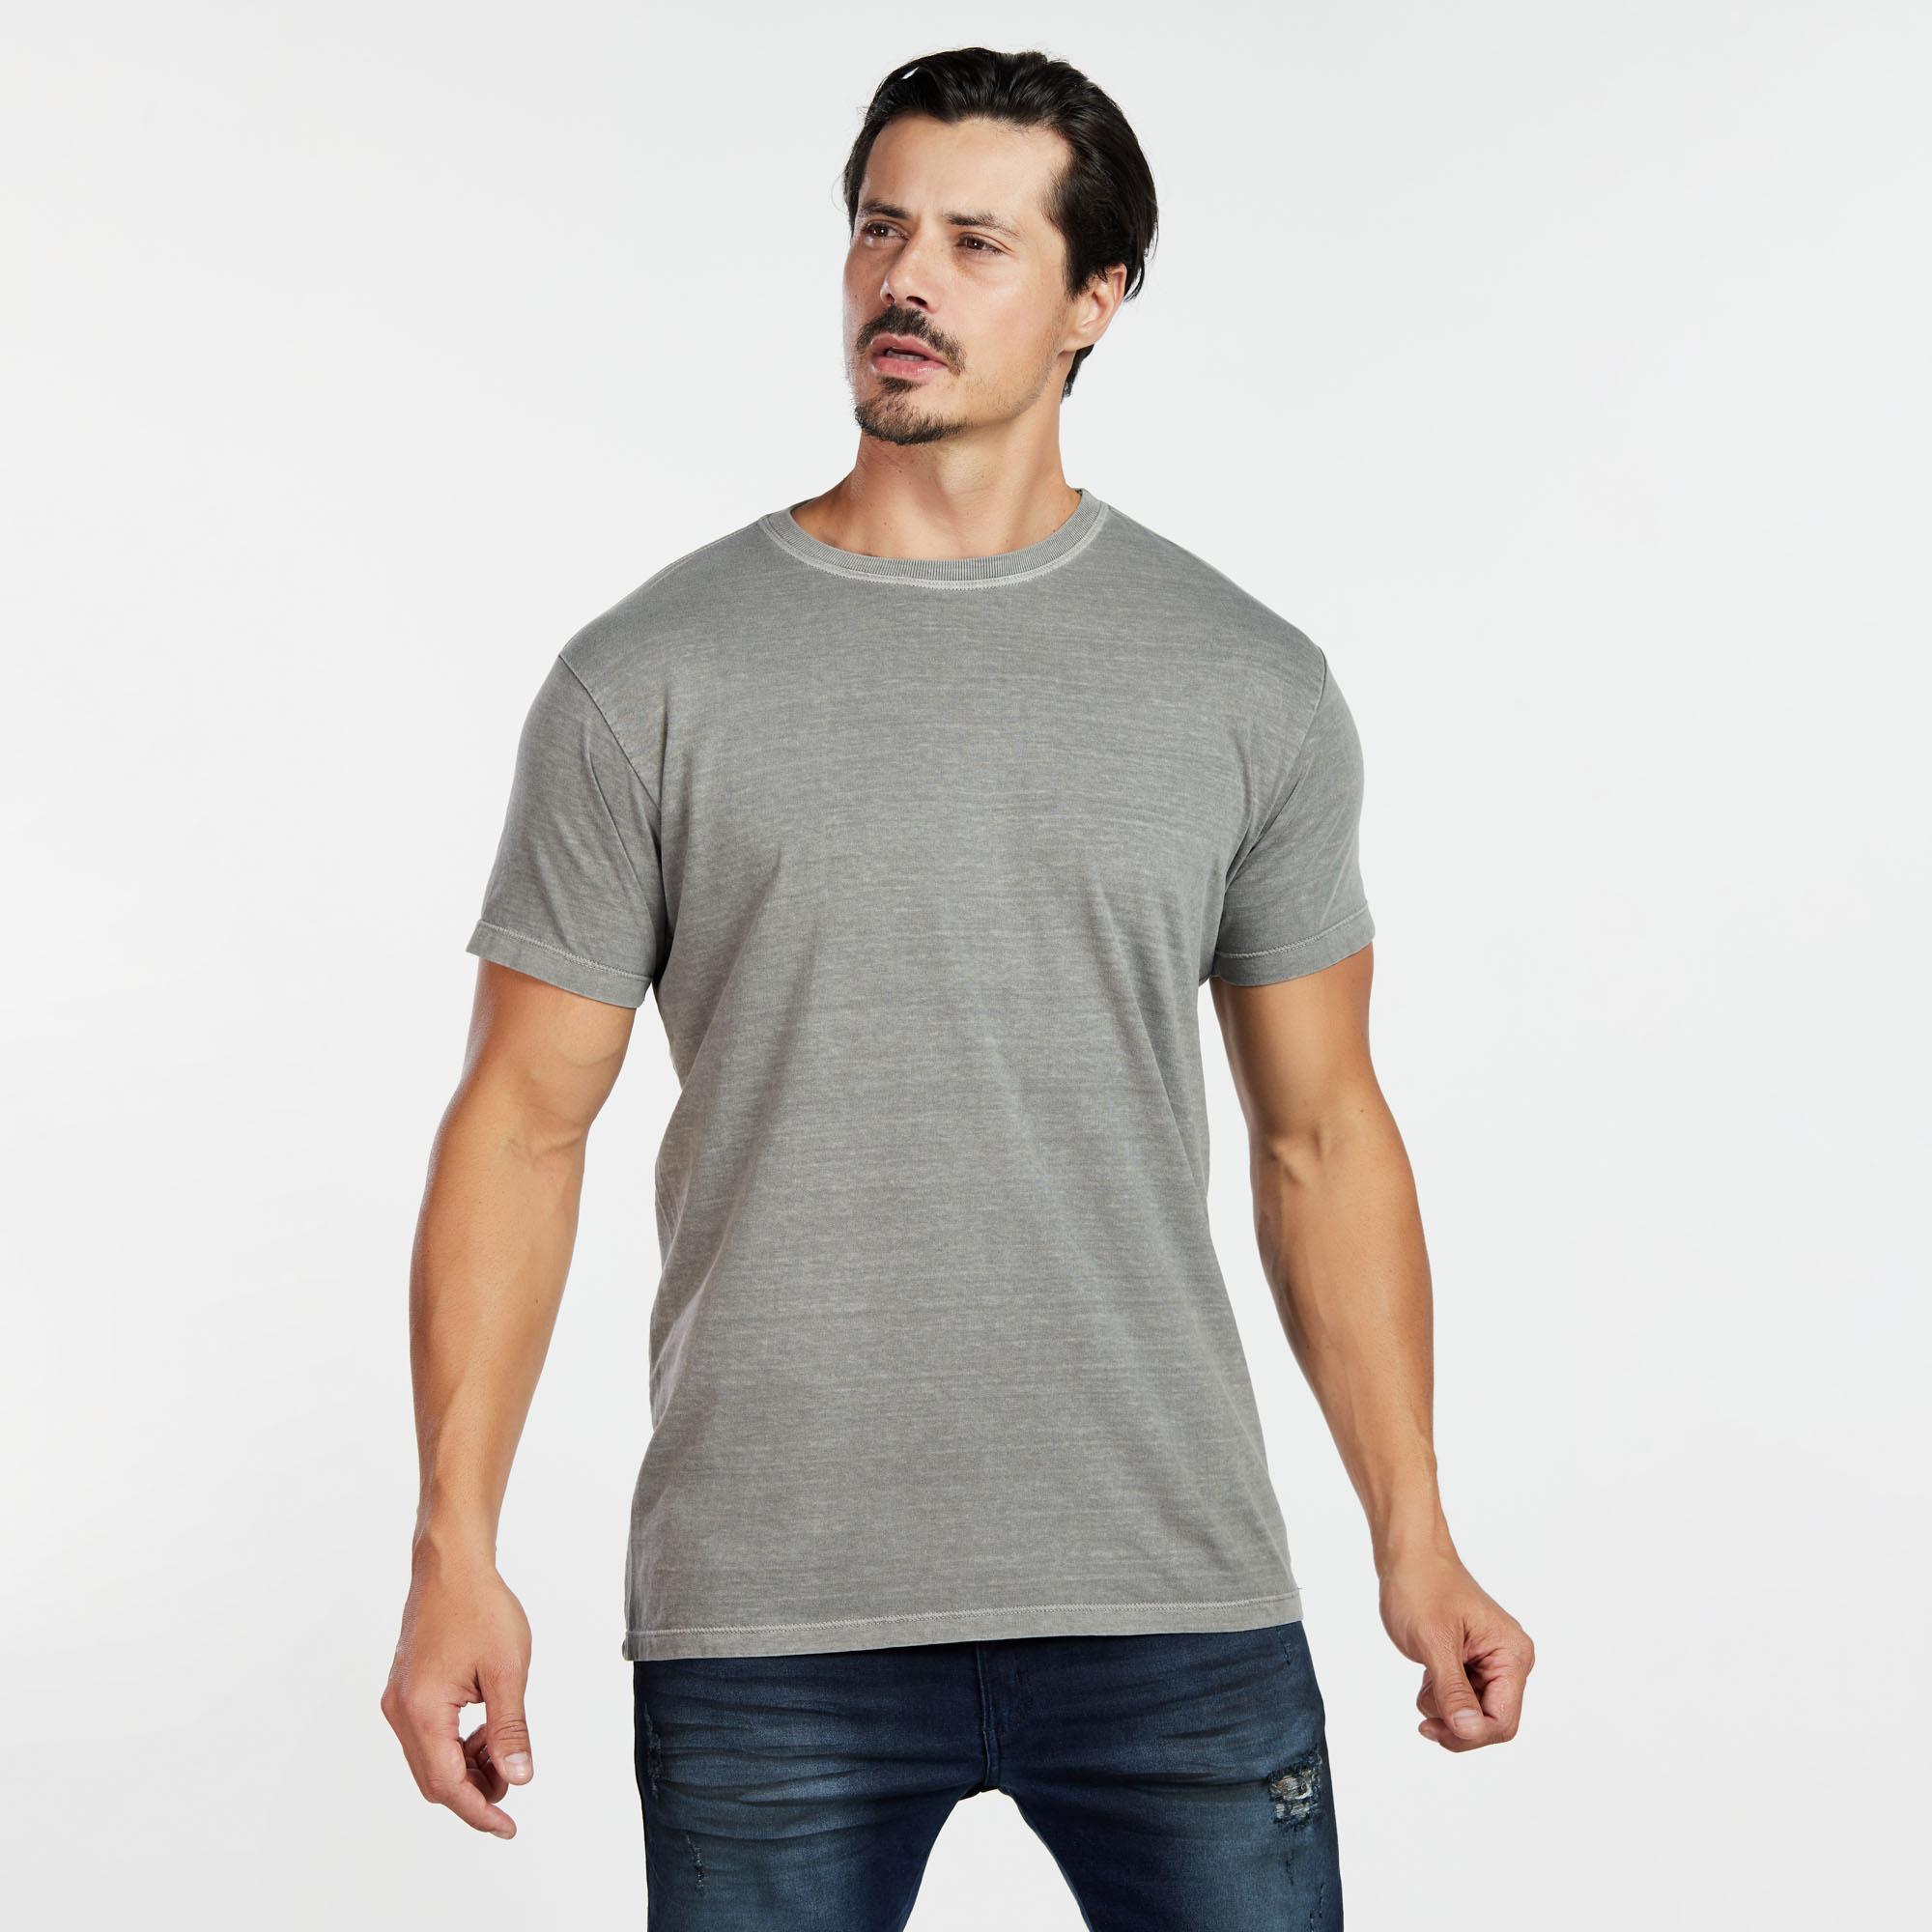 Camiseta Masculina Estonada Cinza Castanho